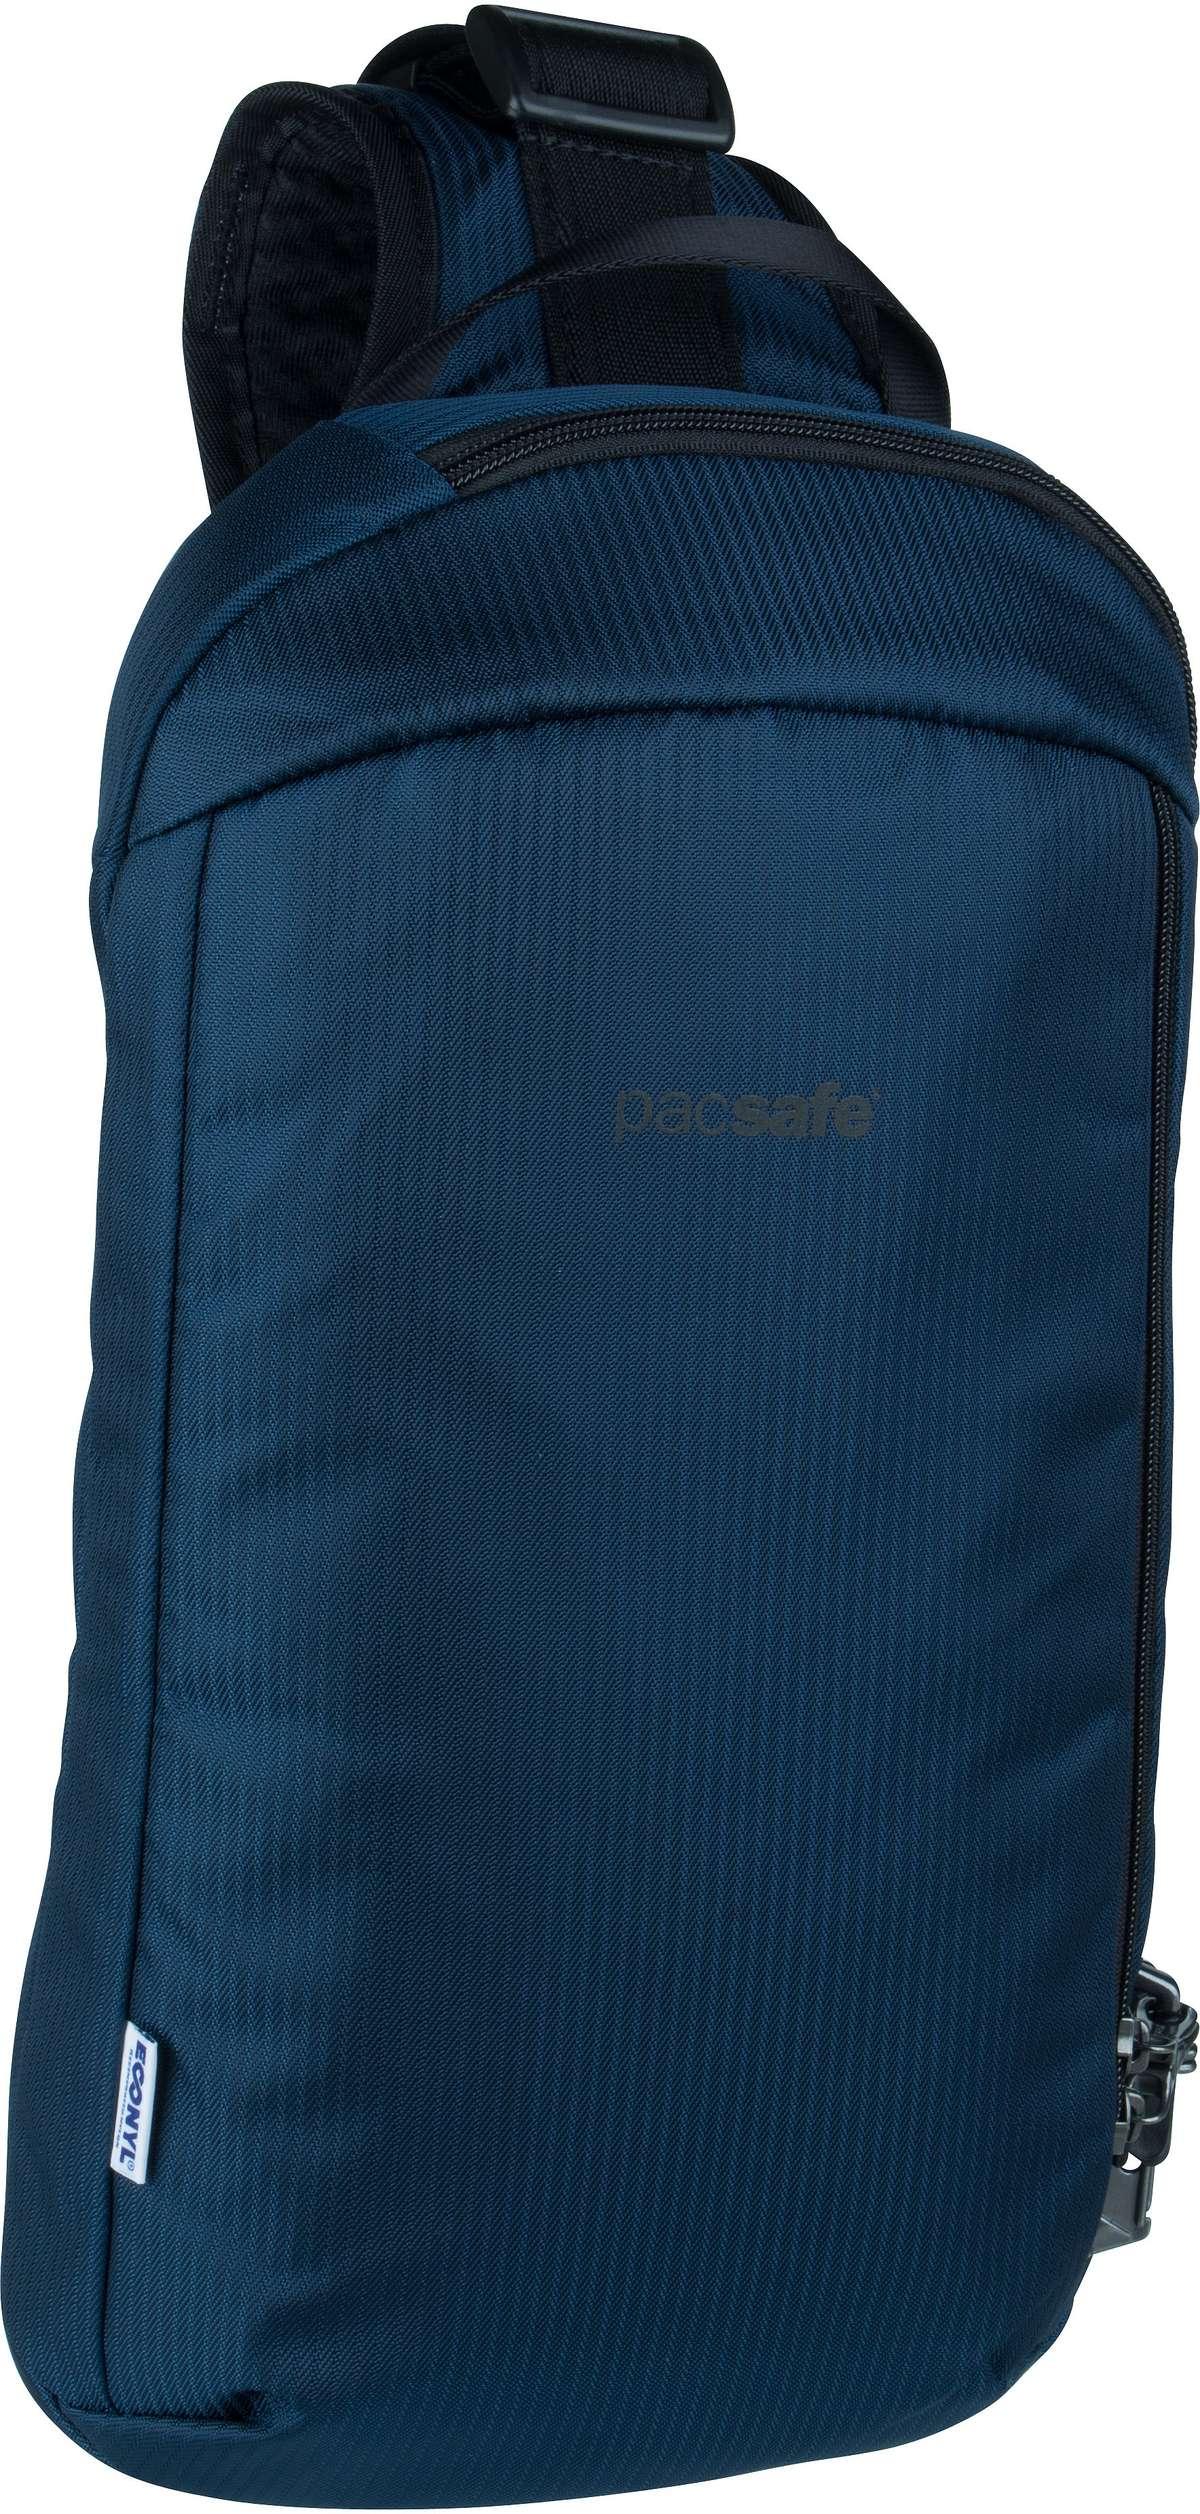 Rucksack / Daypack Vibe 325 ECONYL ECONYL Ocean (10 Liter)